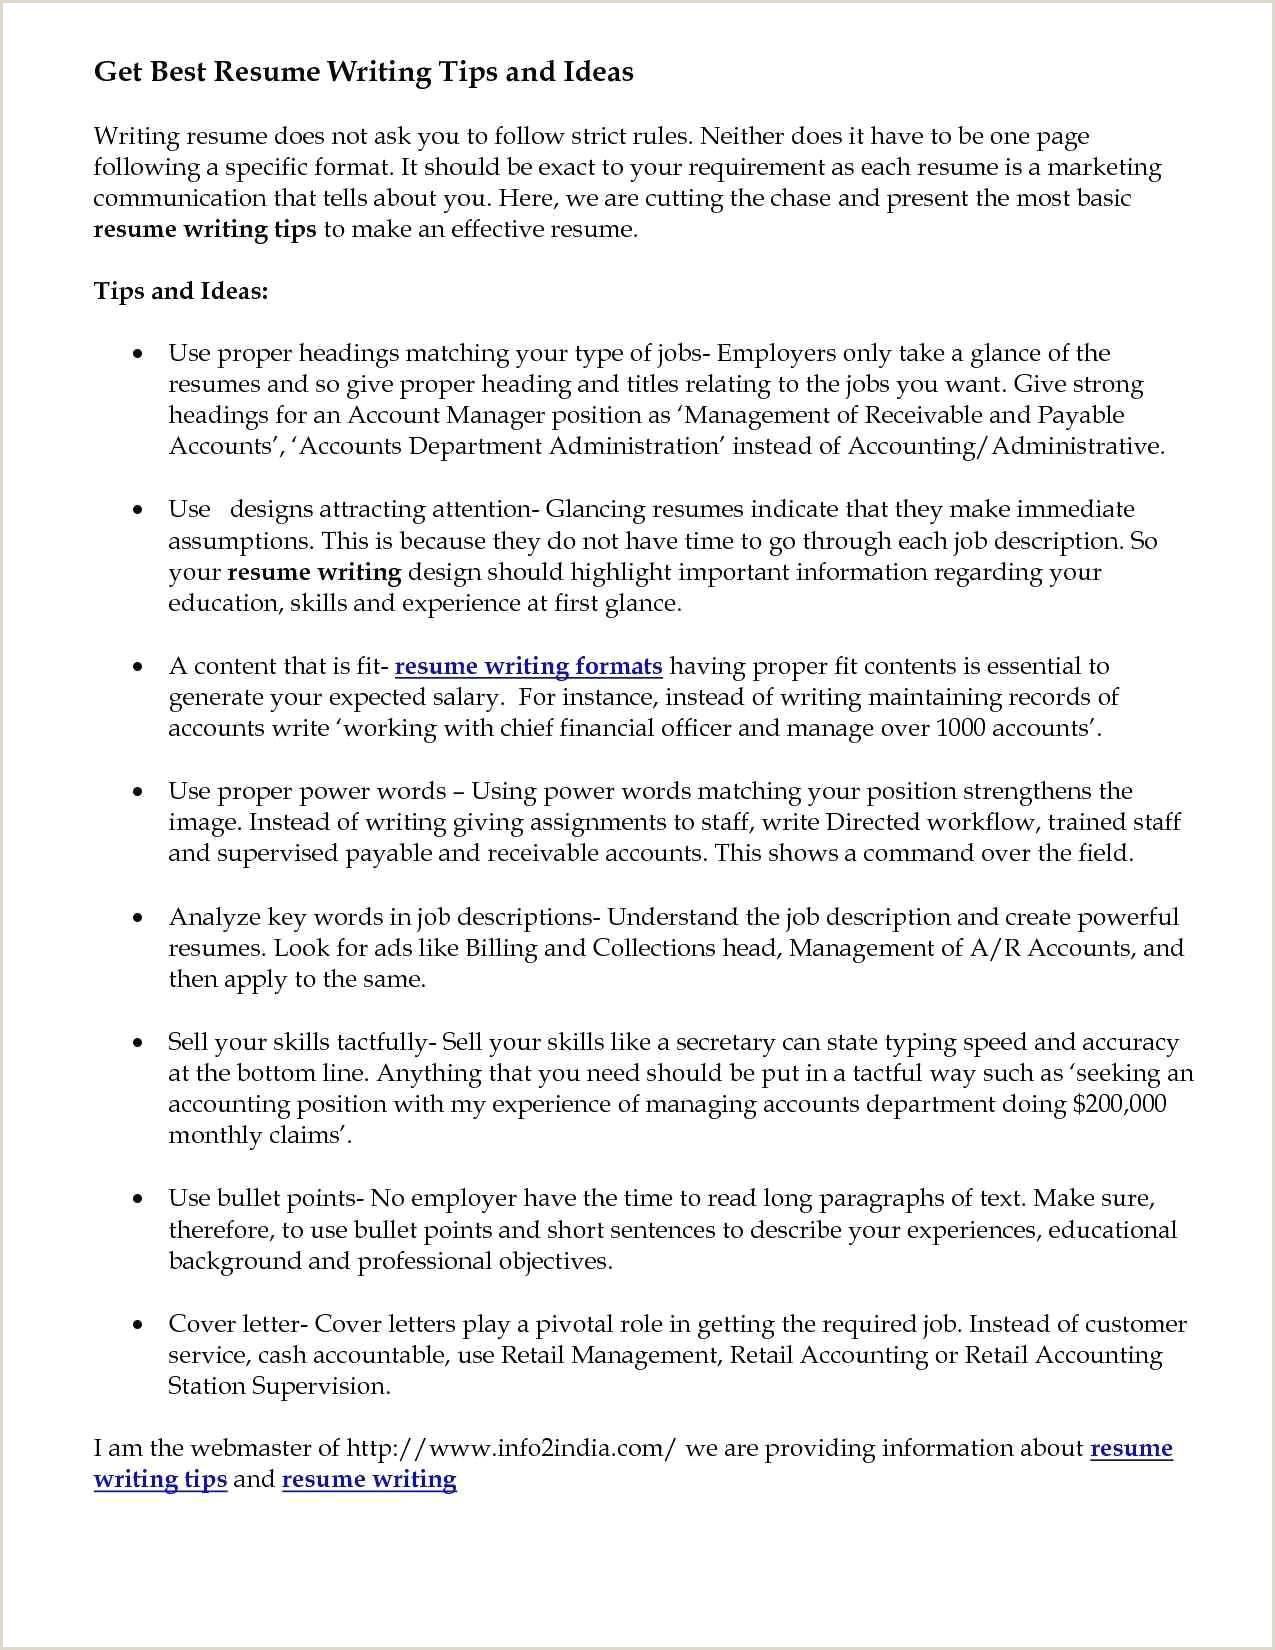 Resume format for Retail Job Bullet Points In Cover Letter Unique Collection Unique